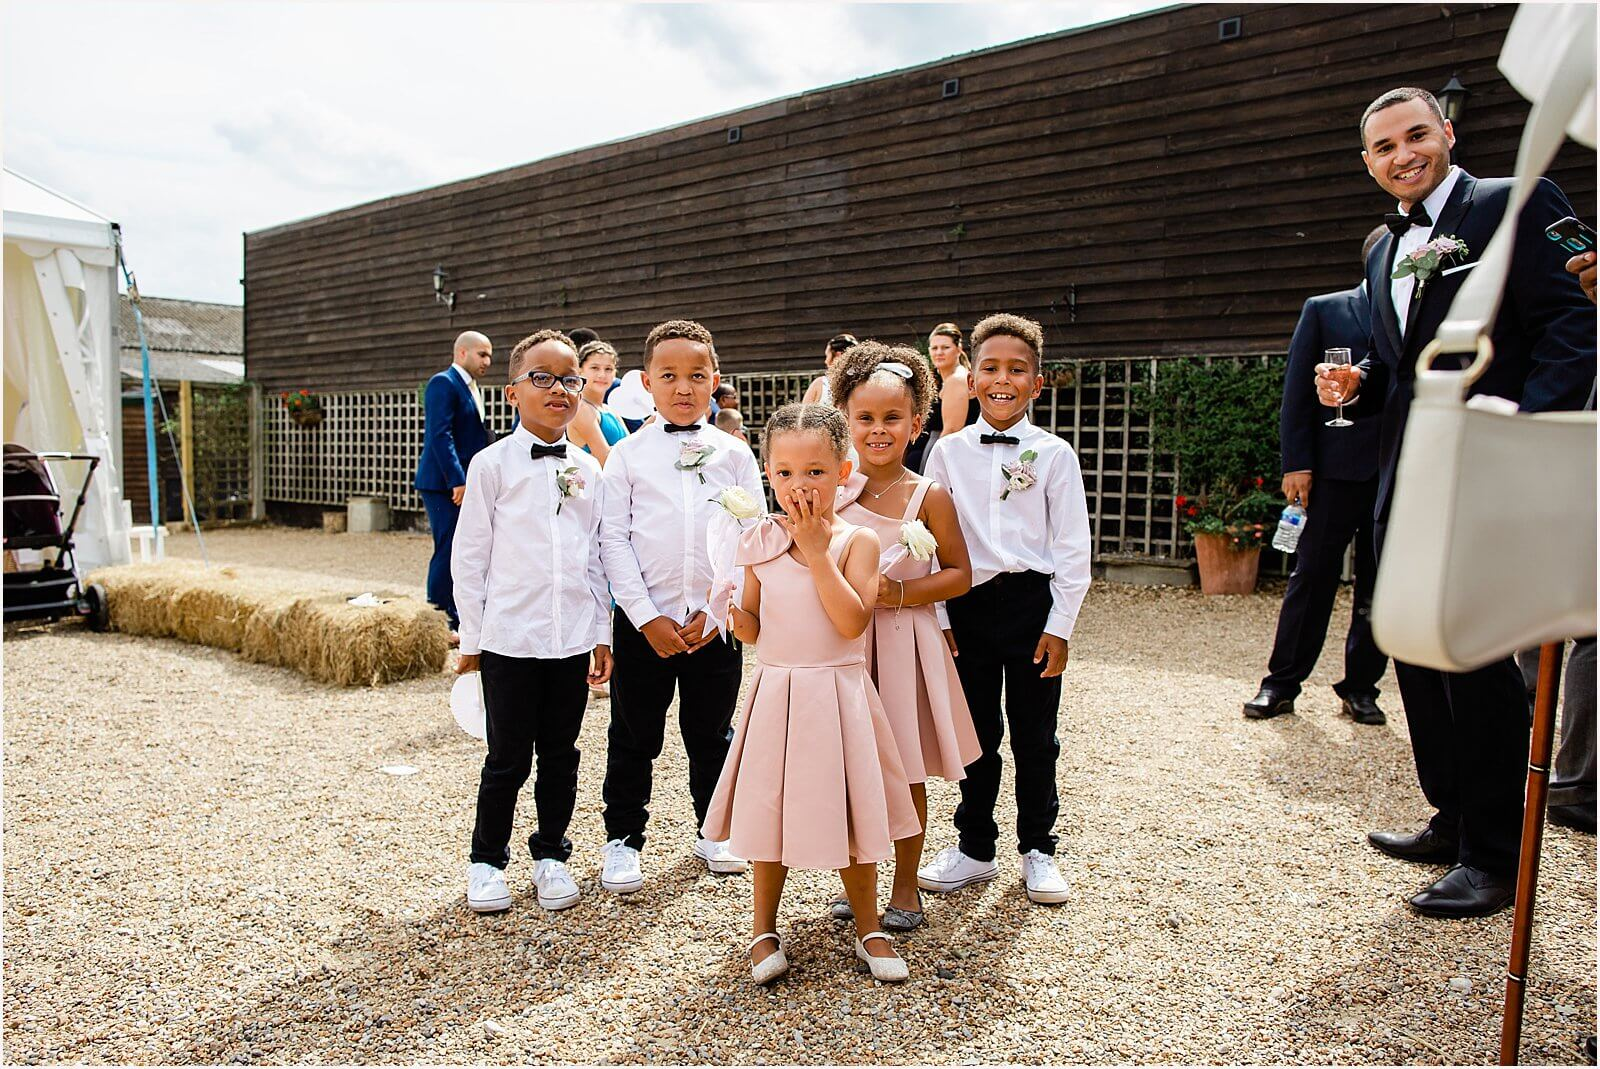 Swallows Oast Wedding - Jakki + Luke's barn wedding photography 32